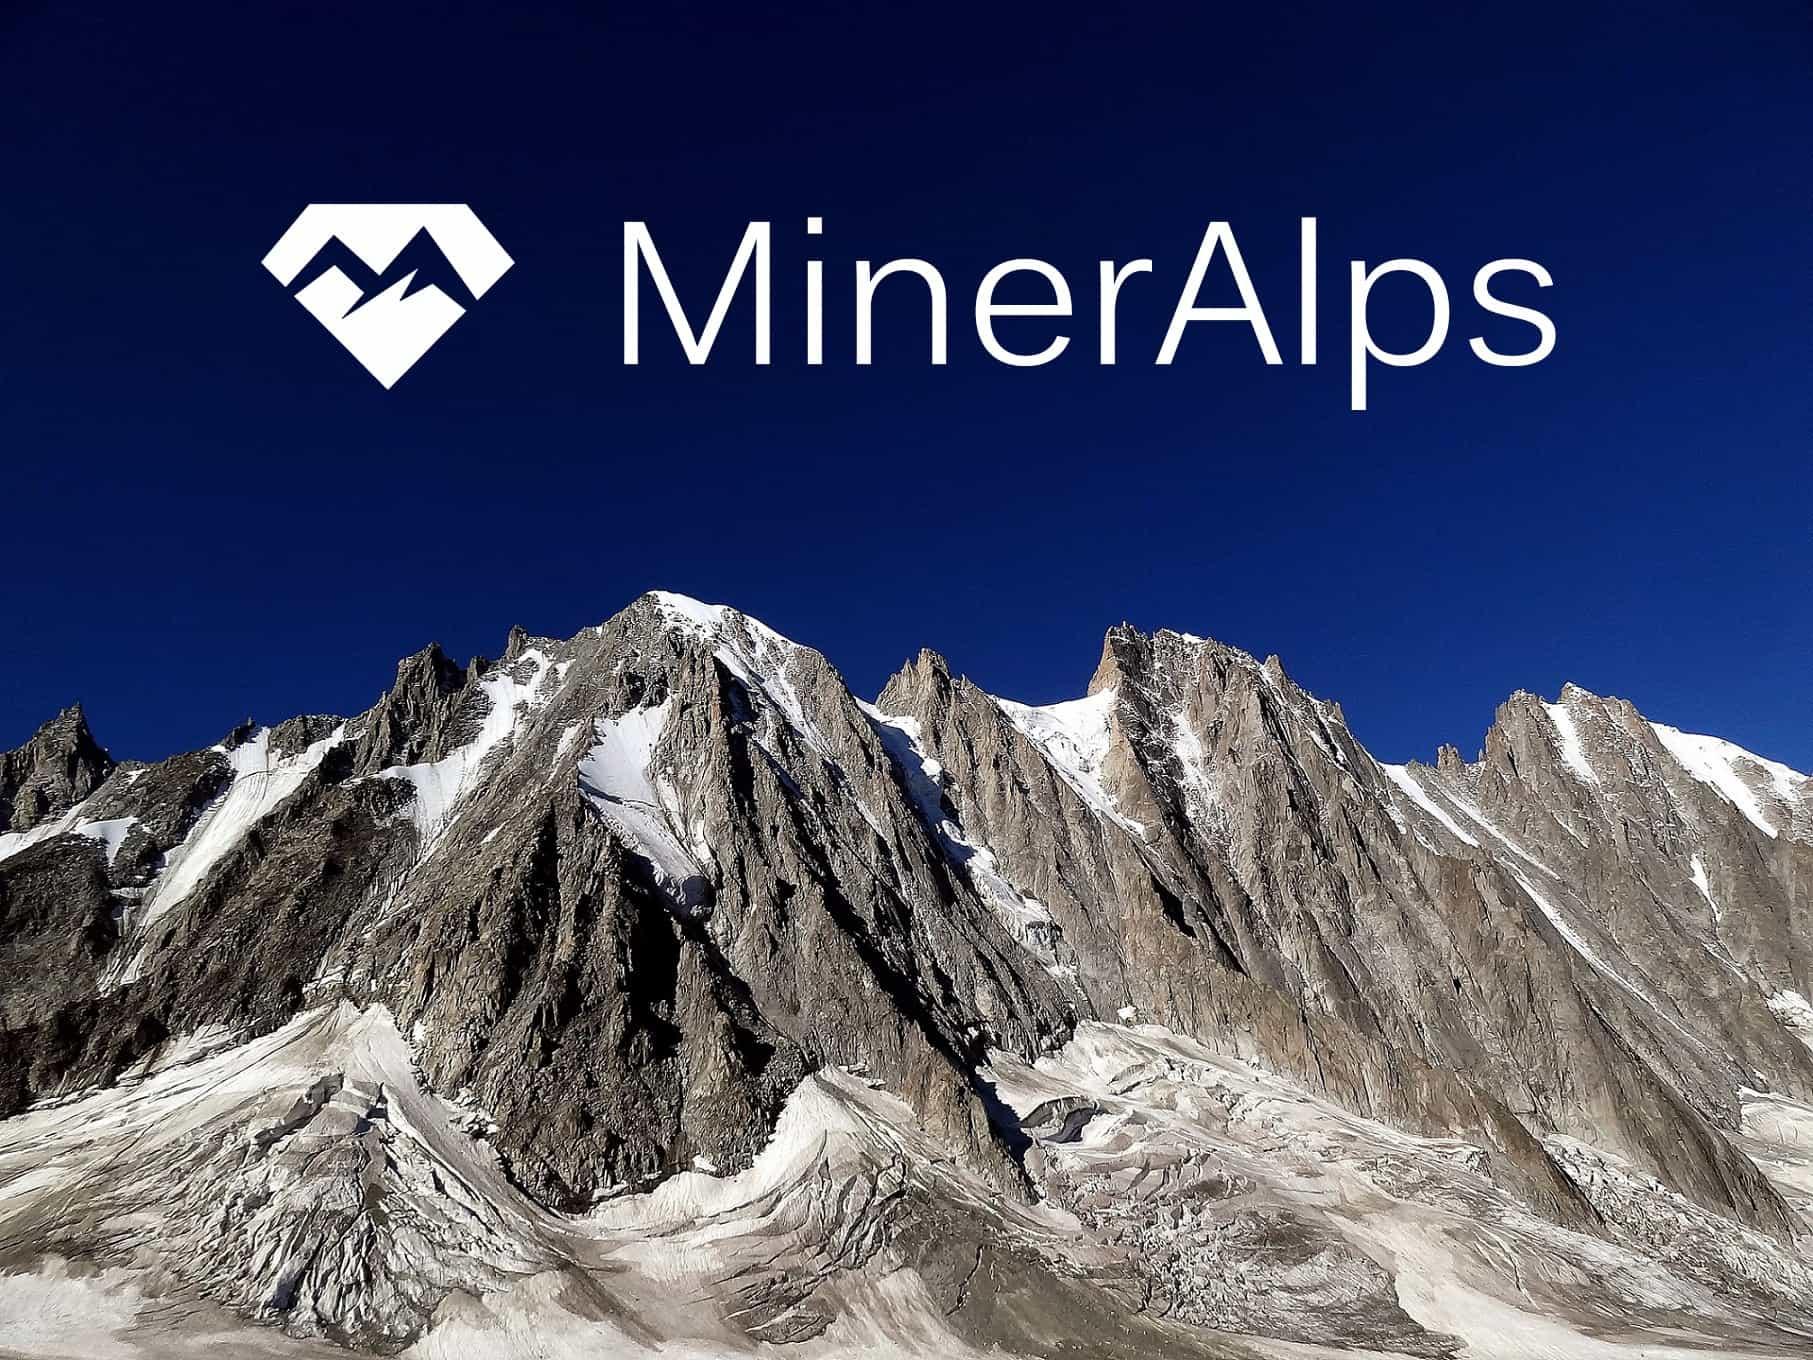 MinerAlps